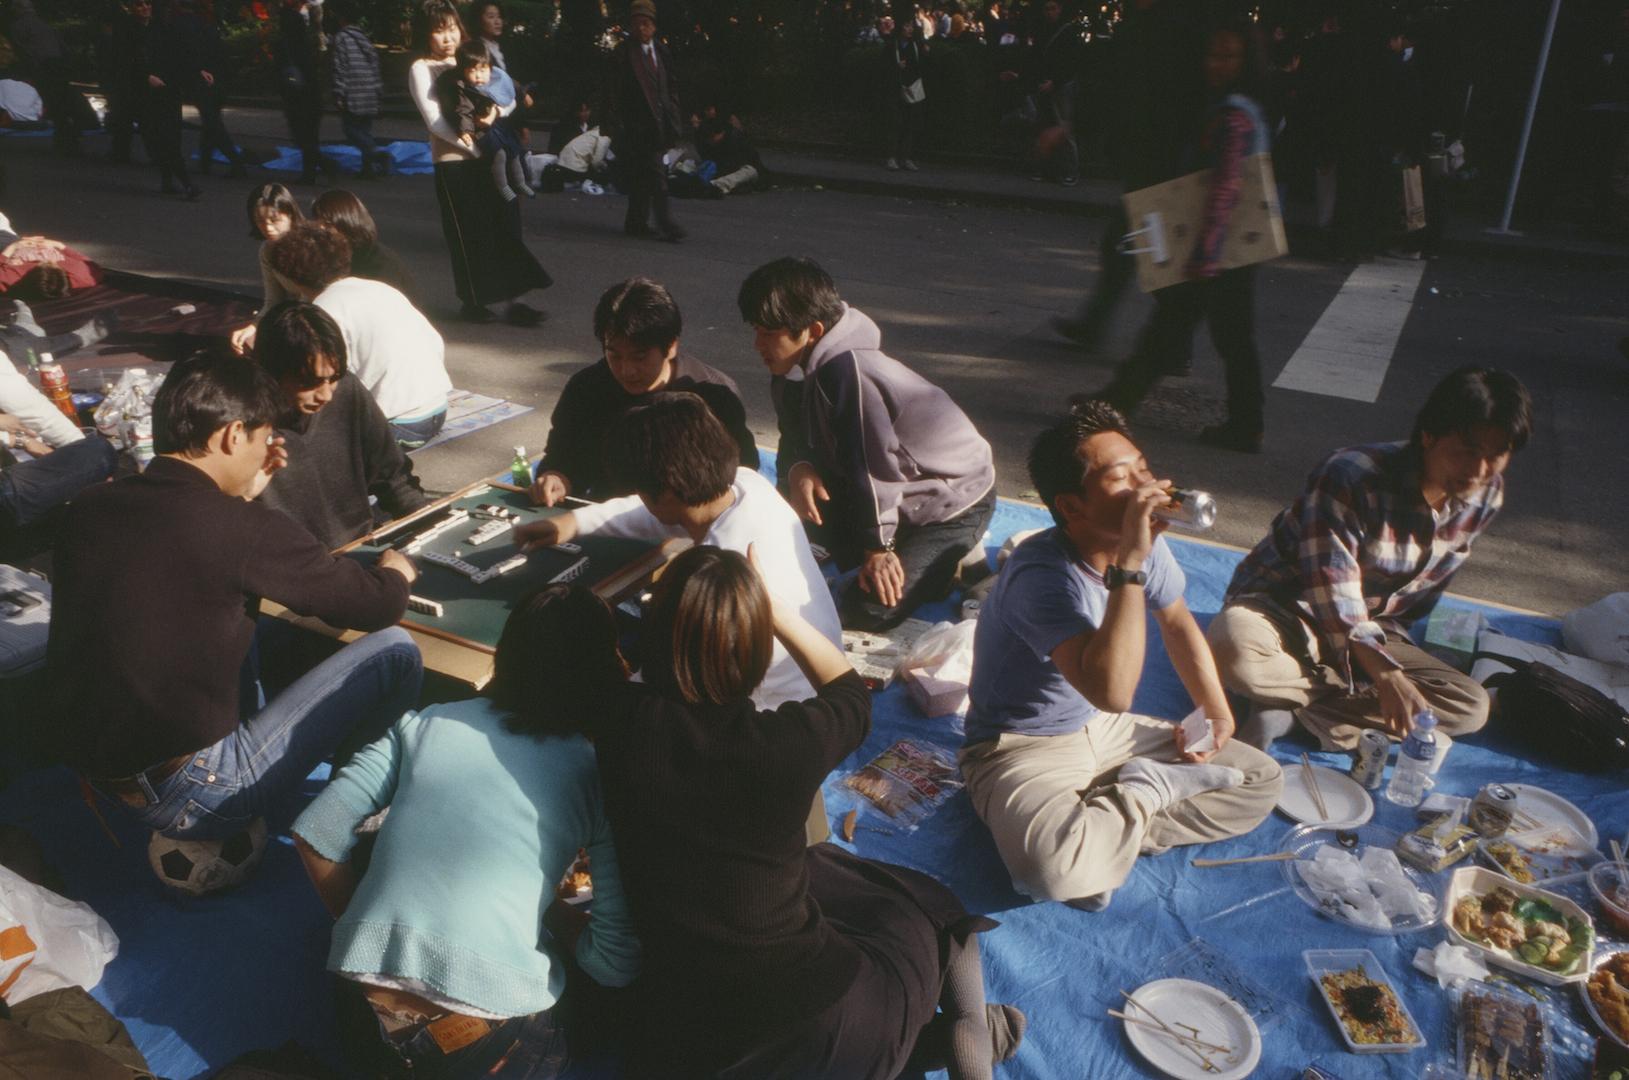 Mah-jong à Hanami au Japon - avril 2000. (Copyright : Bruno Birolli)